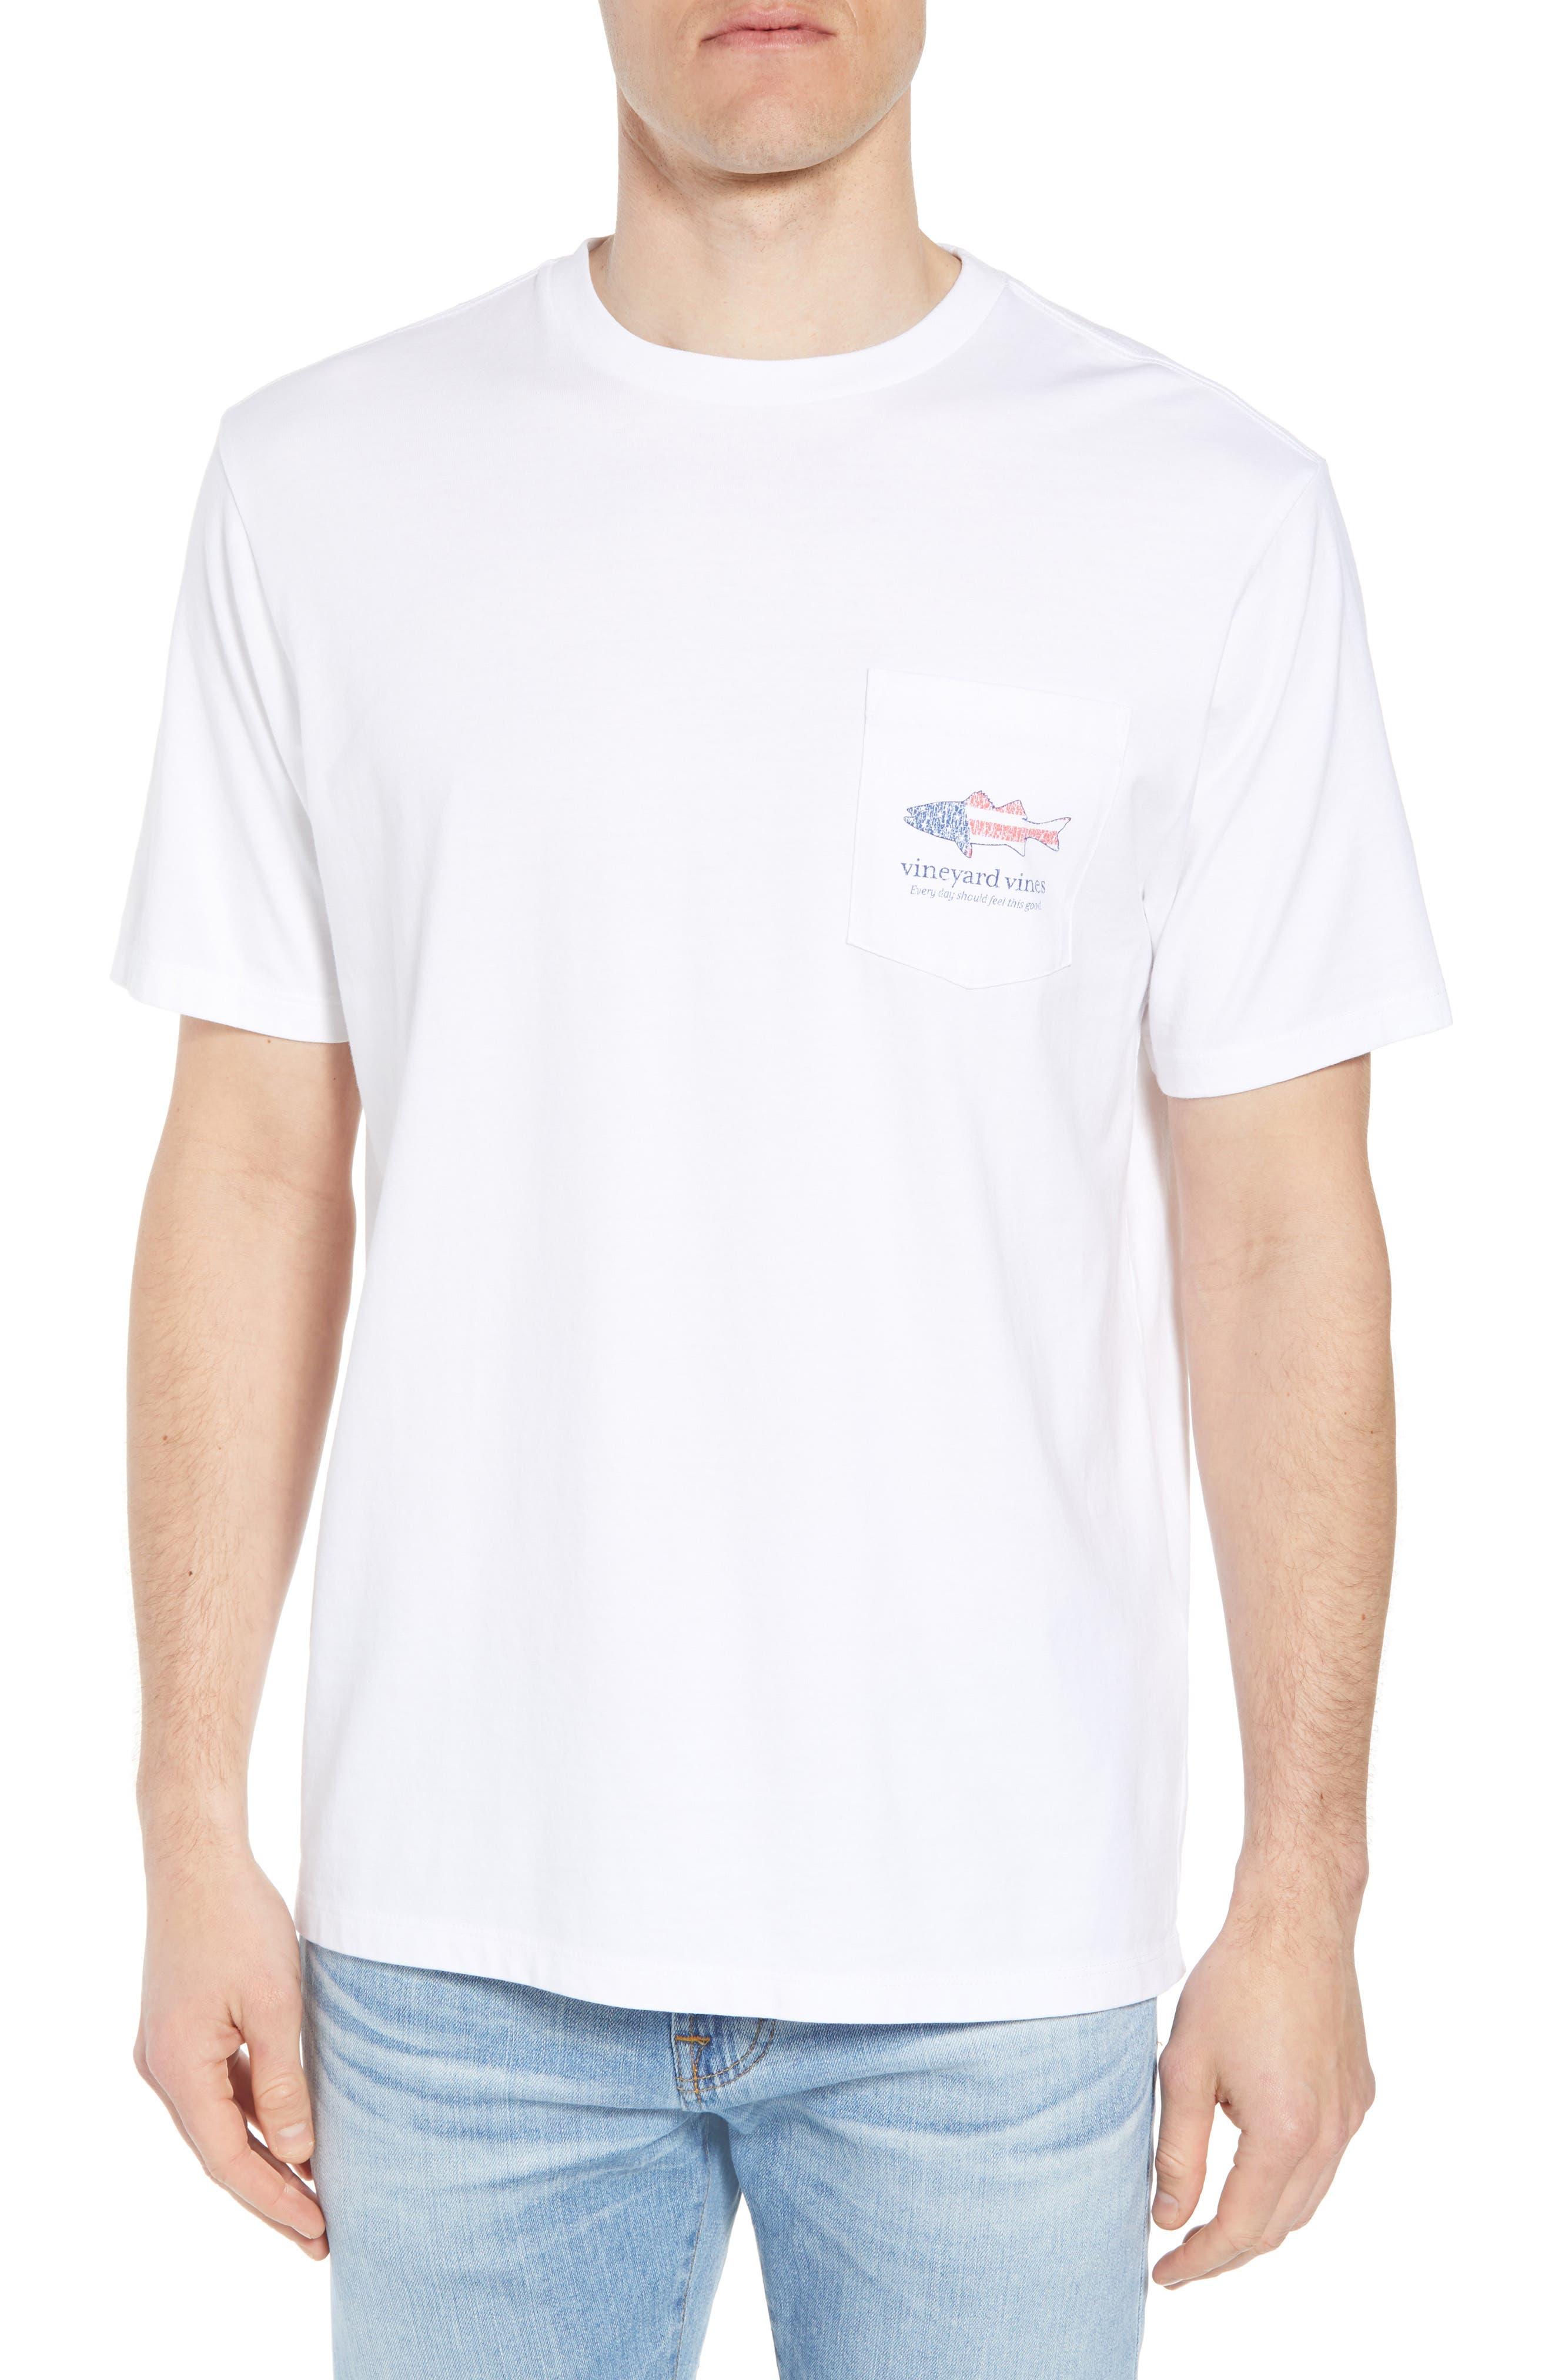 Grouper Flat Crewneck T-Shirt,                             Main thumbnail 1, color,                             White Cap